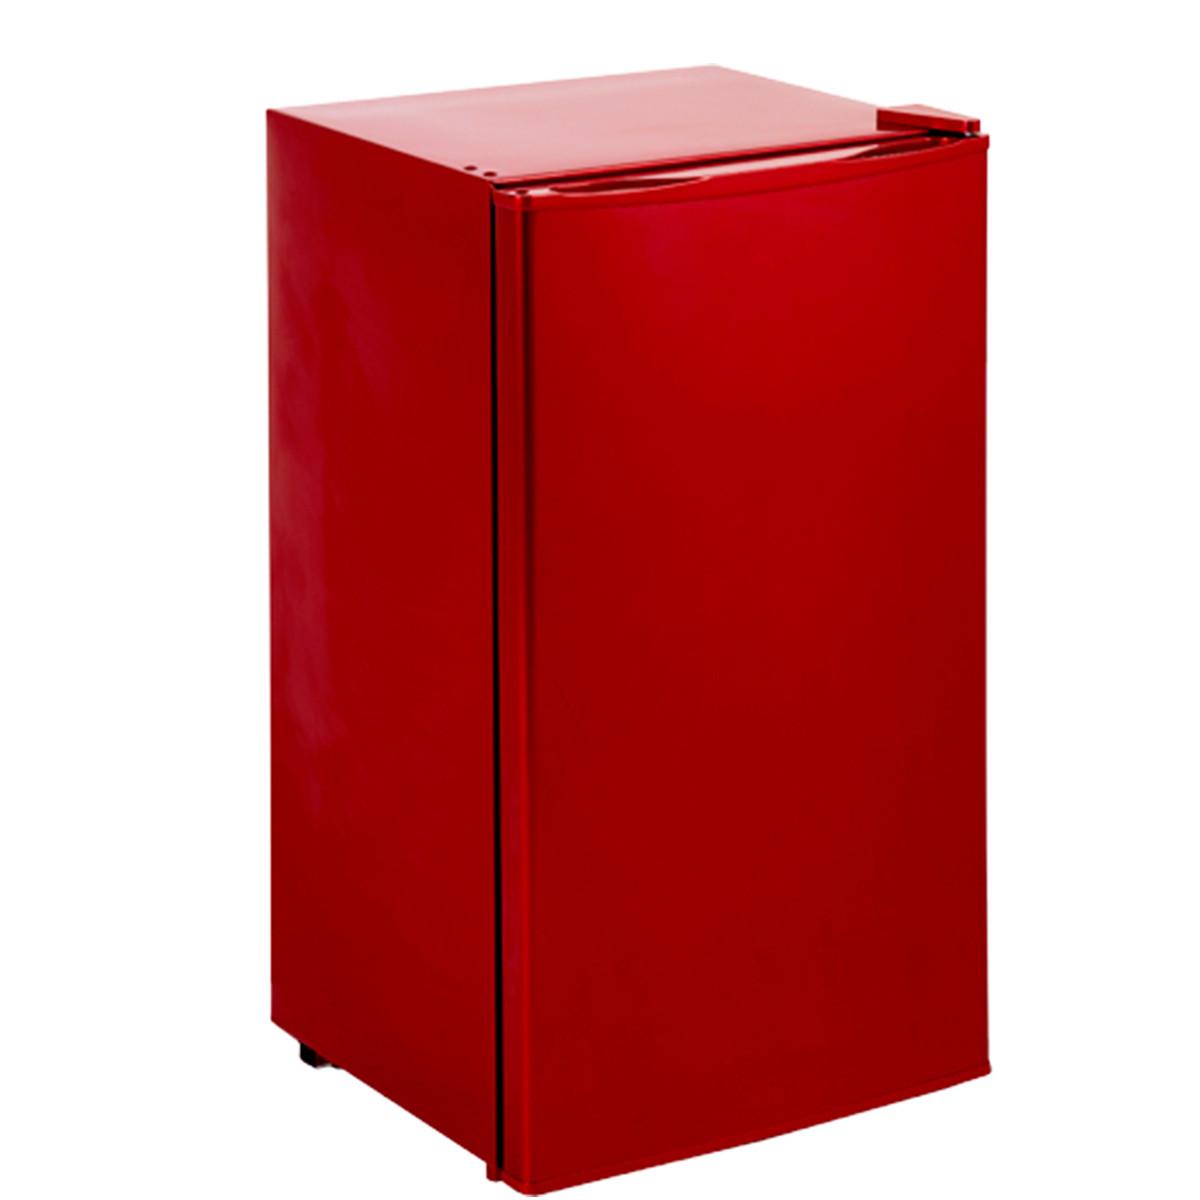 Avanti Oven | Avanti Refrigerator | 7.4 Cubic Foot Refrigerator